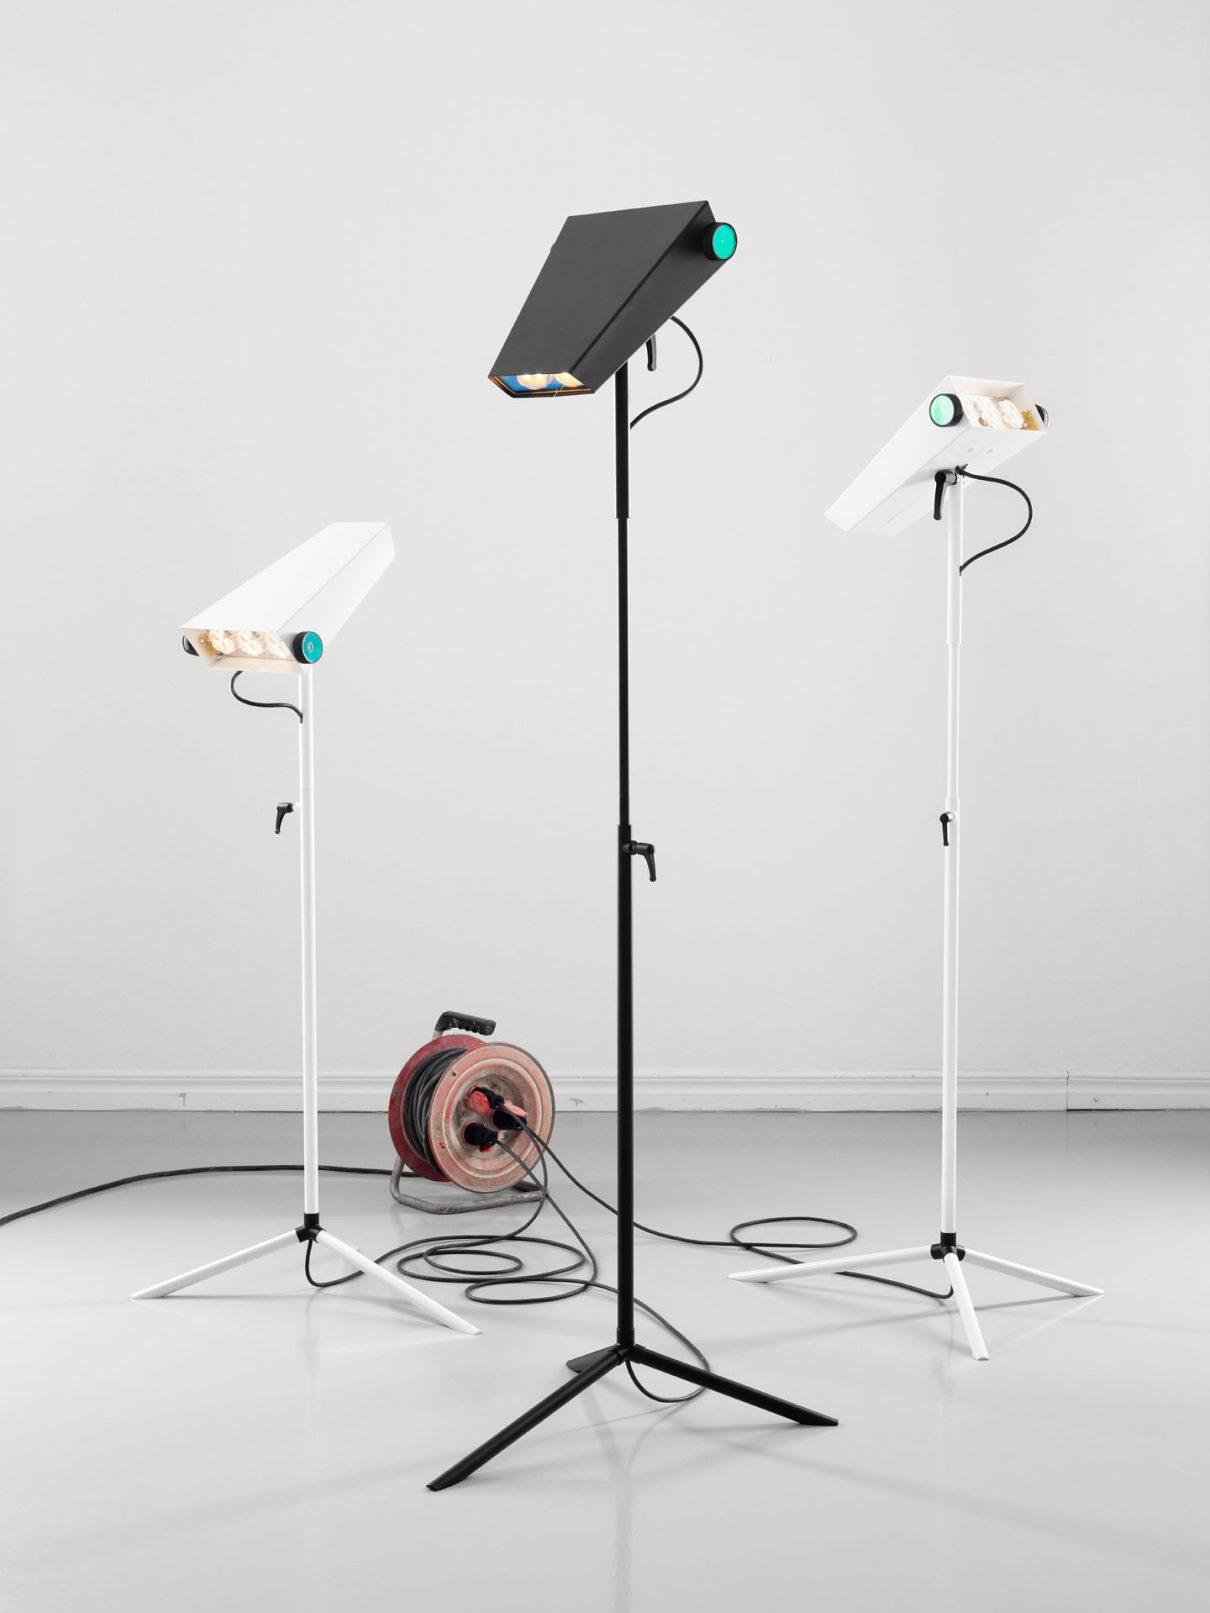 Futuristische robotlamp van Jangir Maddadi Design Bureau